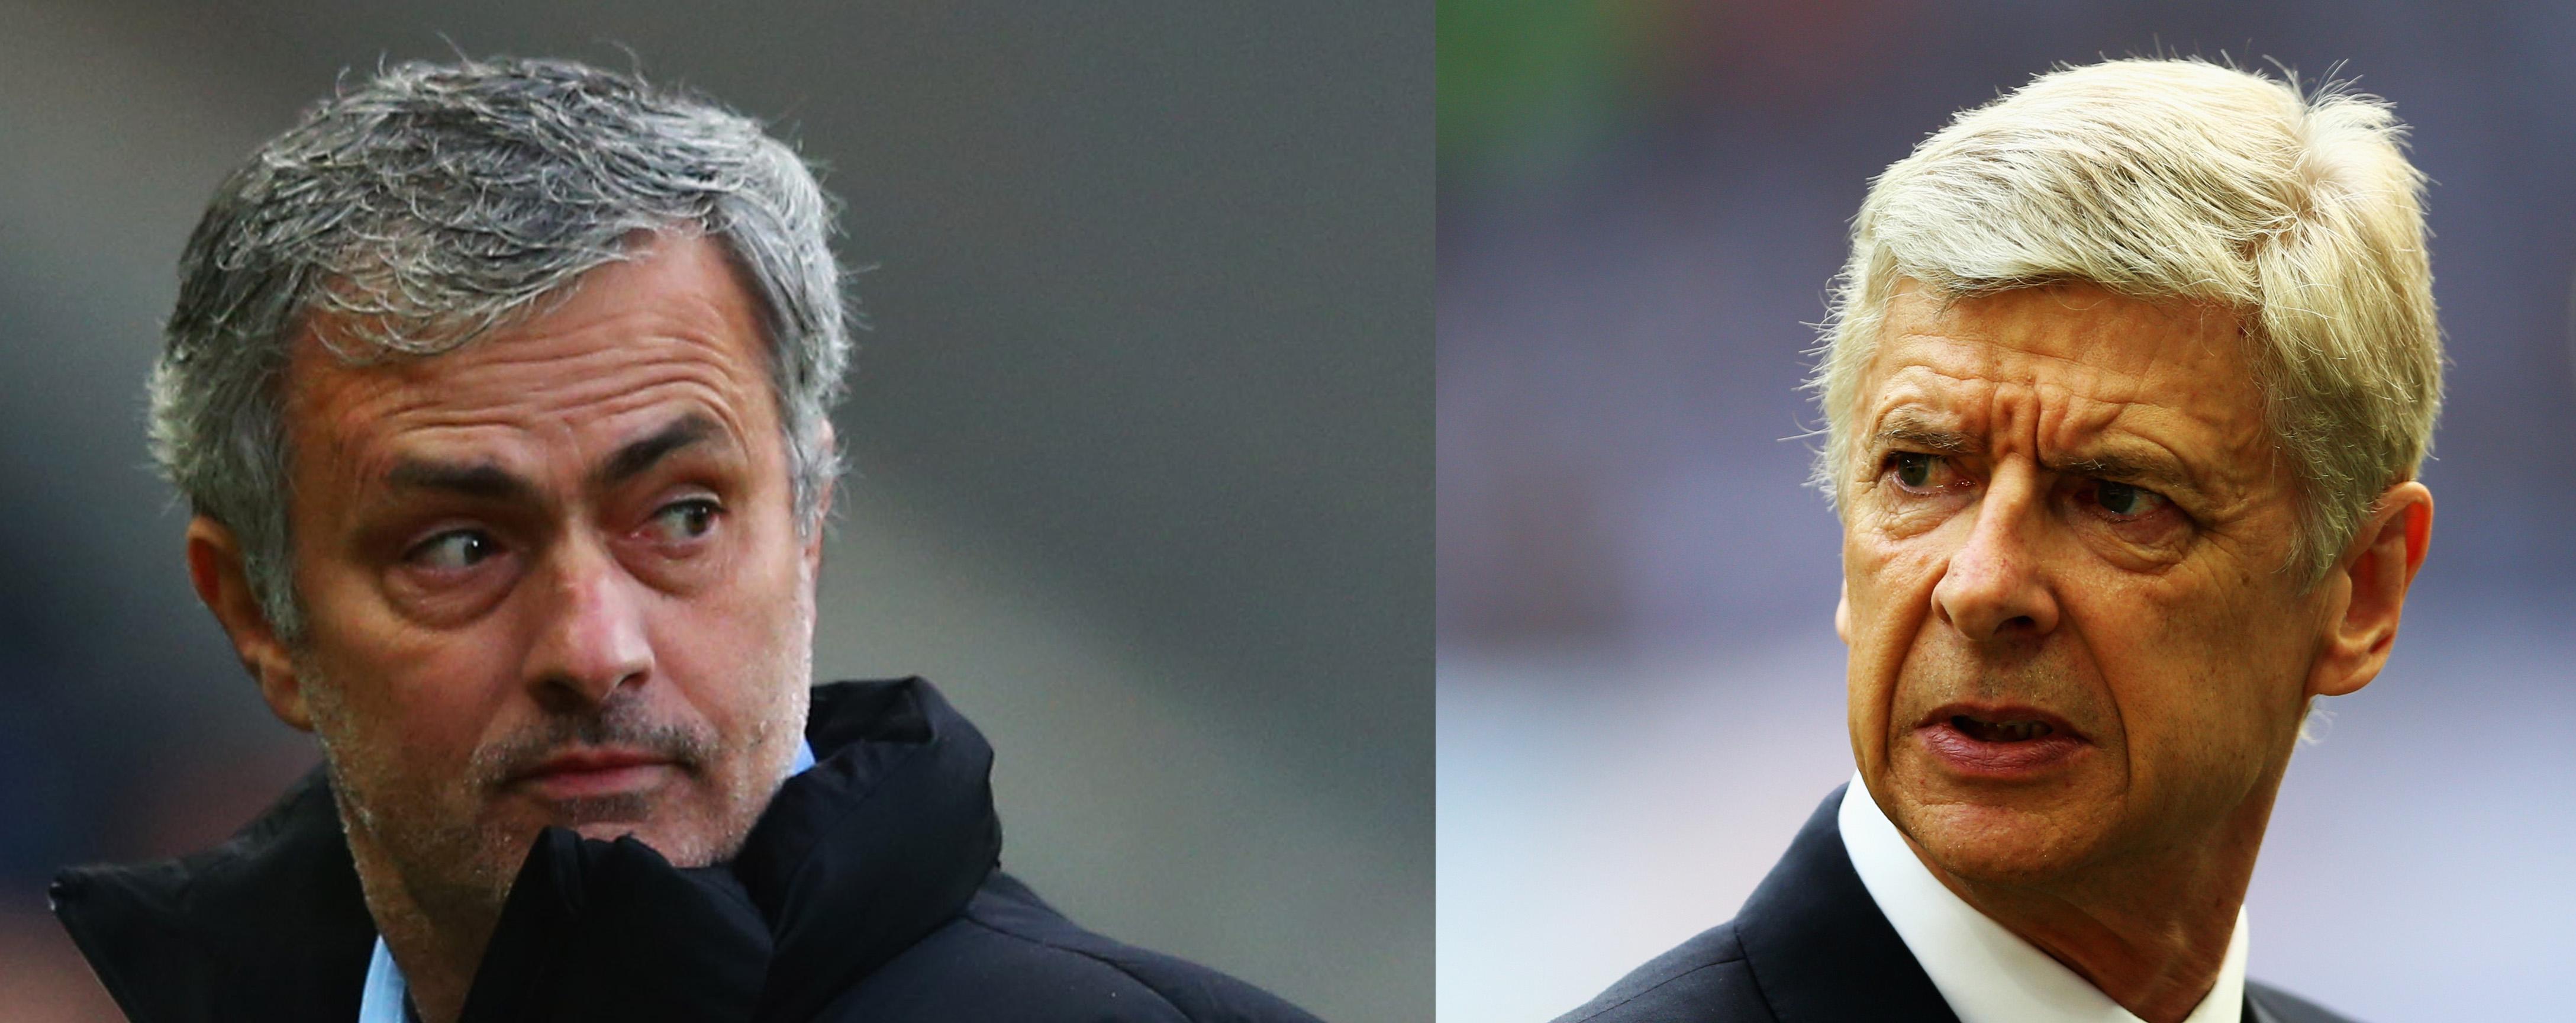 Josè Mourinho vs Arsene Wenger